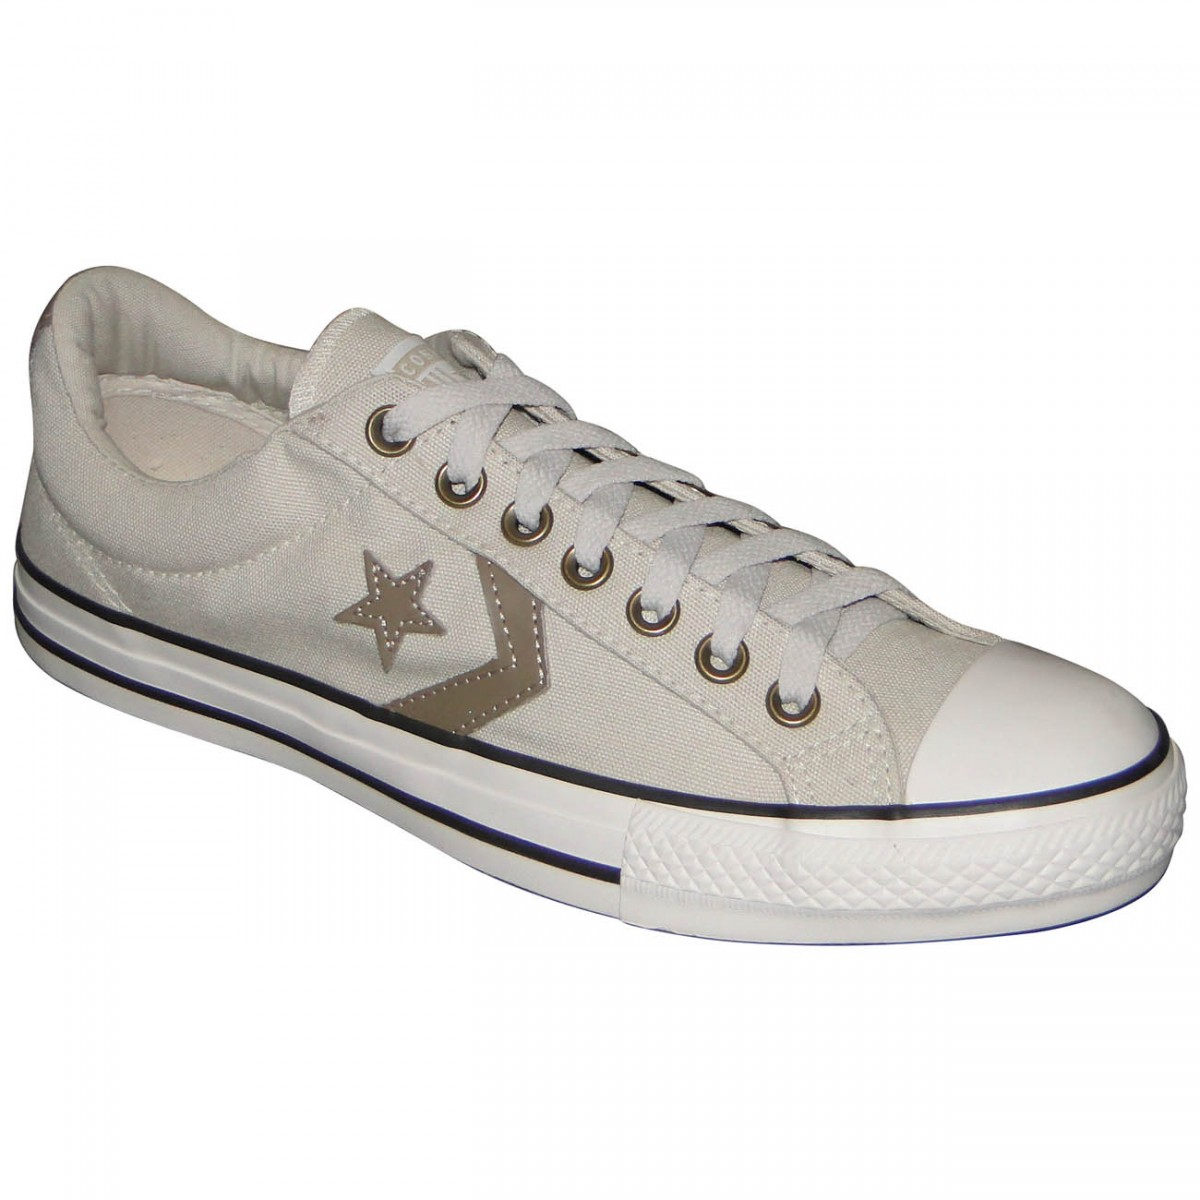 b0fa8043efe TENIS ALL STAR CONVERSE STAR PLAYER CO055693BEGCAQ - BEGE CAQUI - Chuteira  Nike